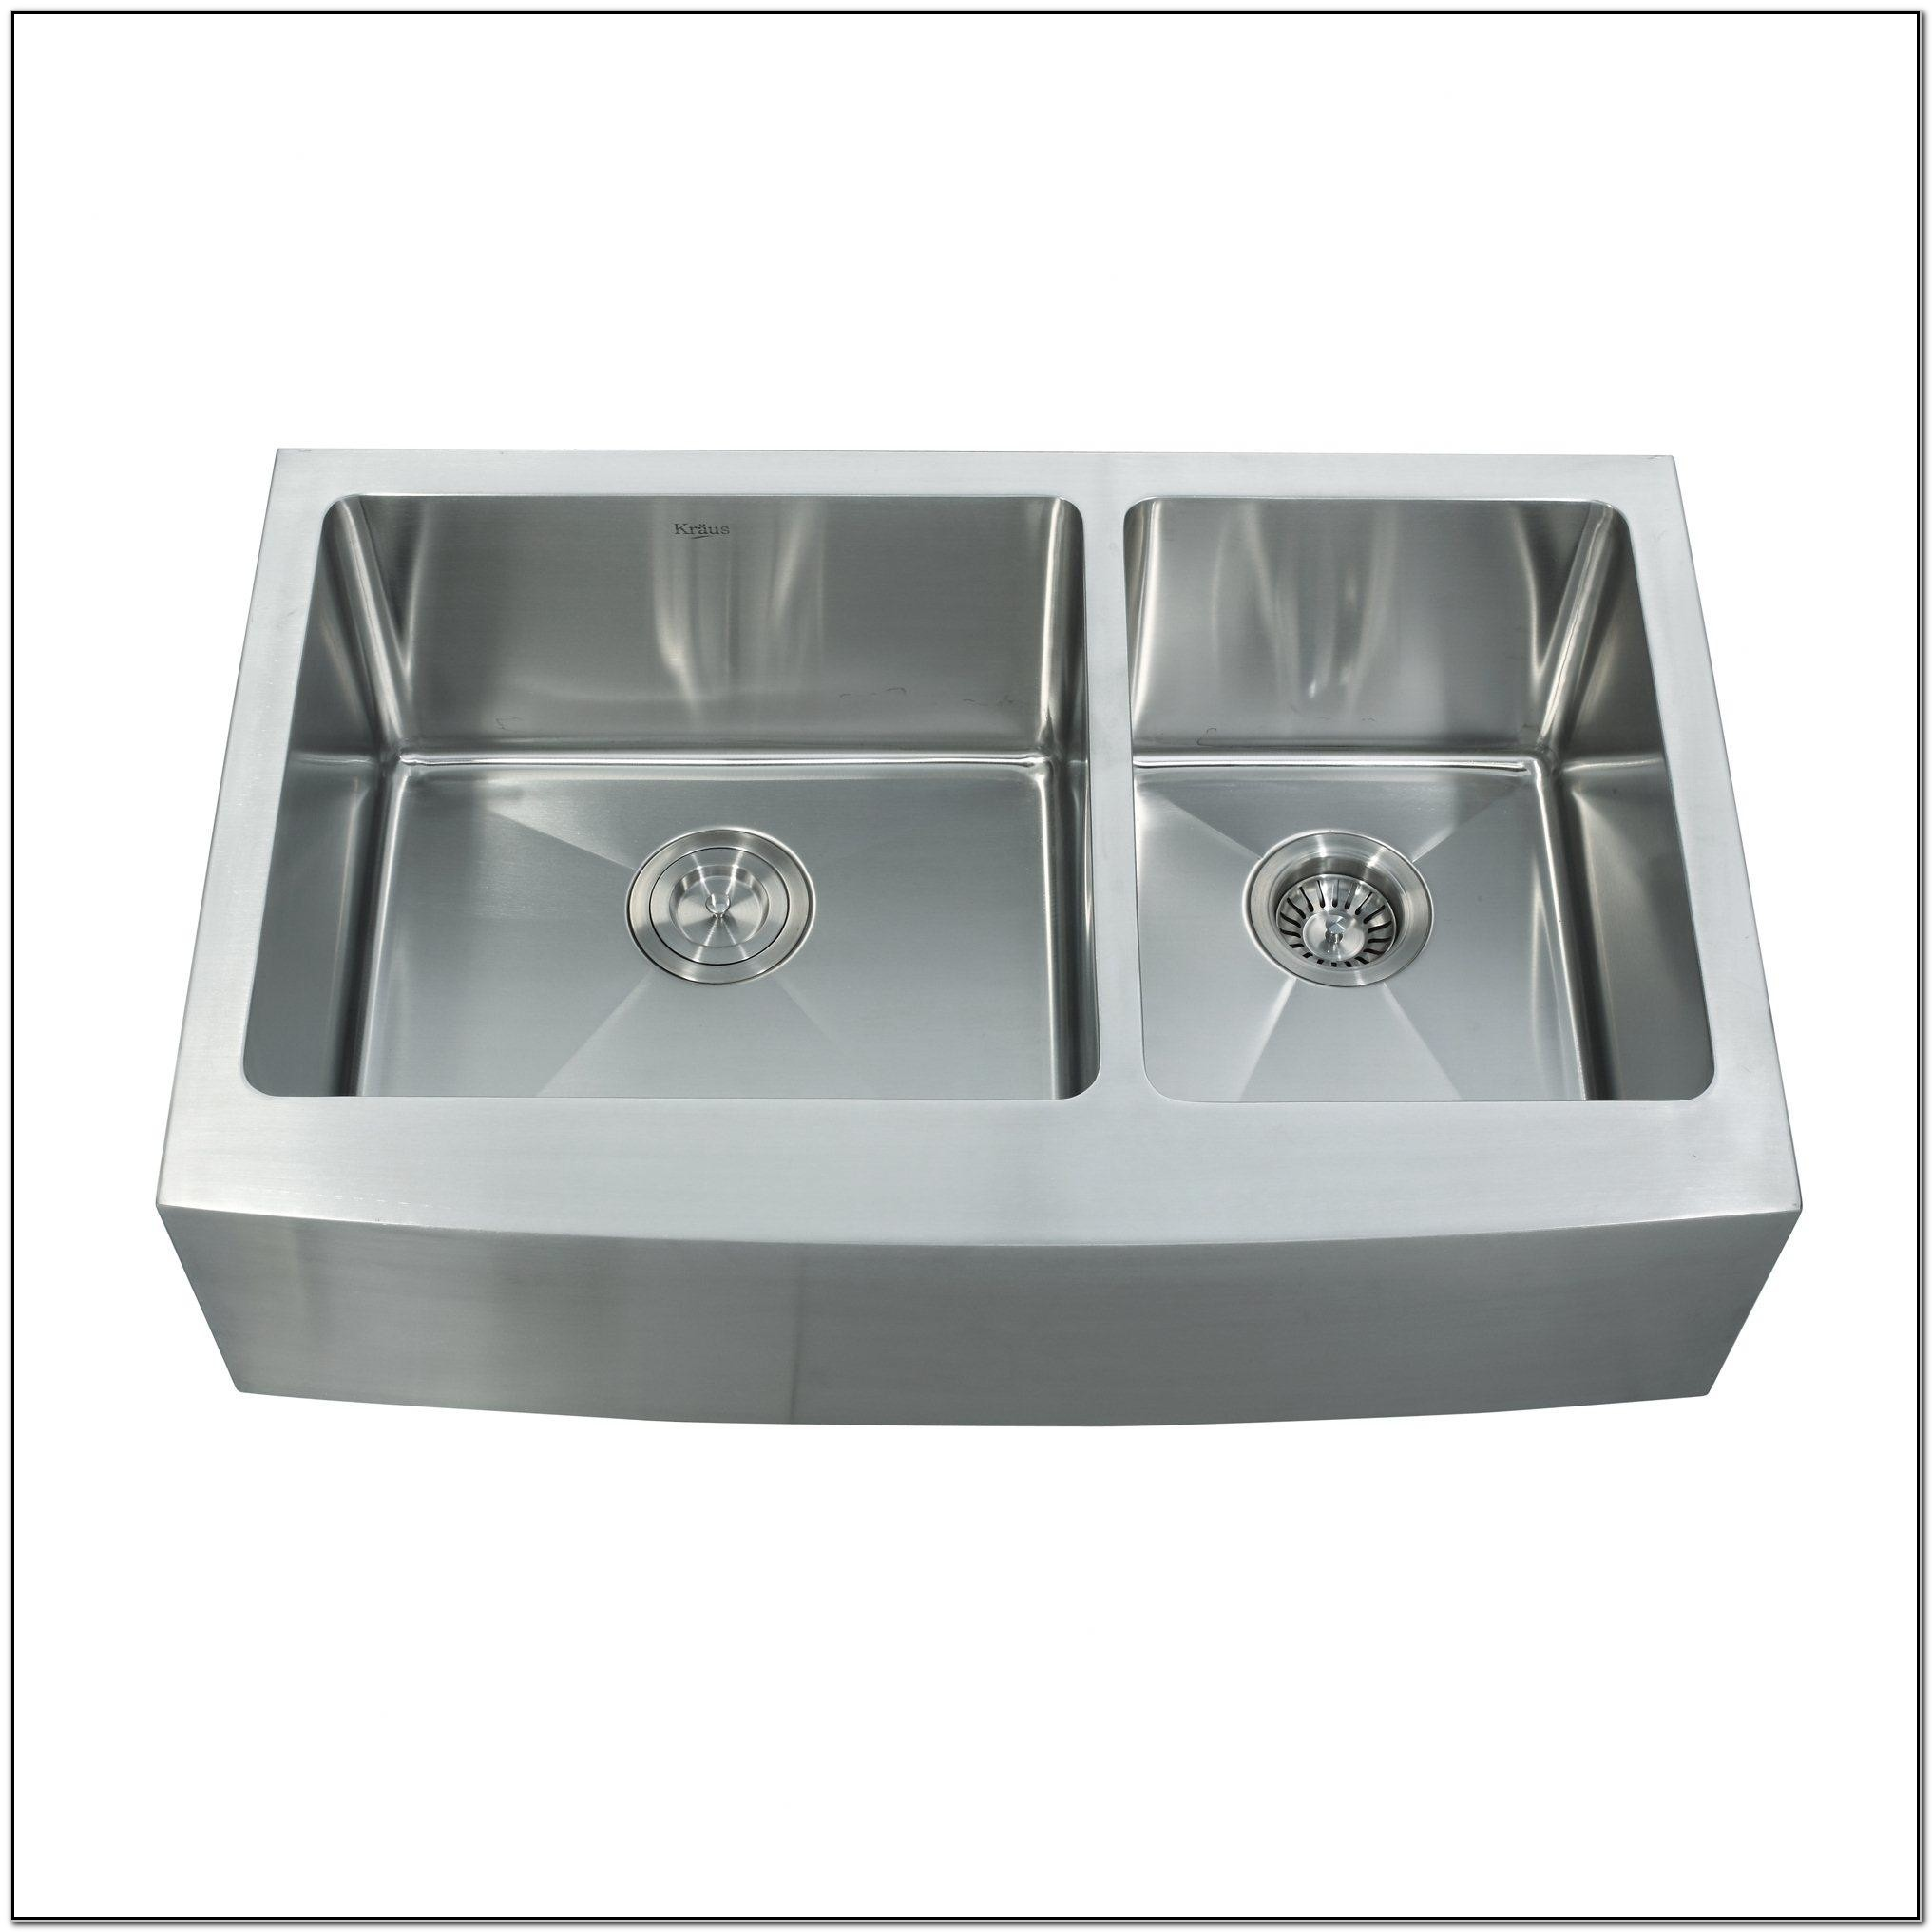 Soap Dispenser Kitchen Sink Pros Cons